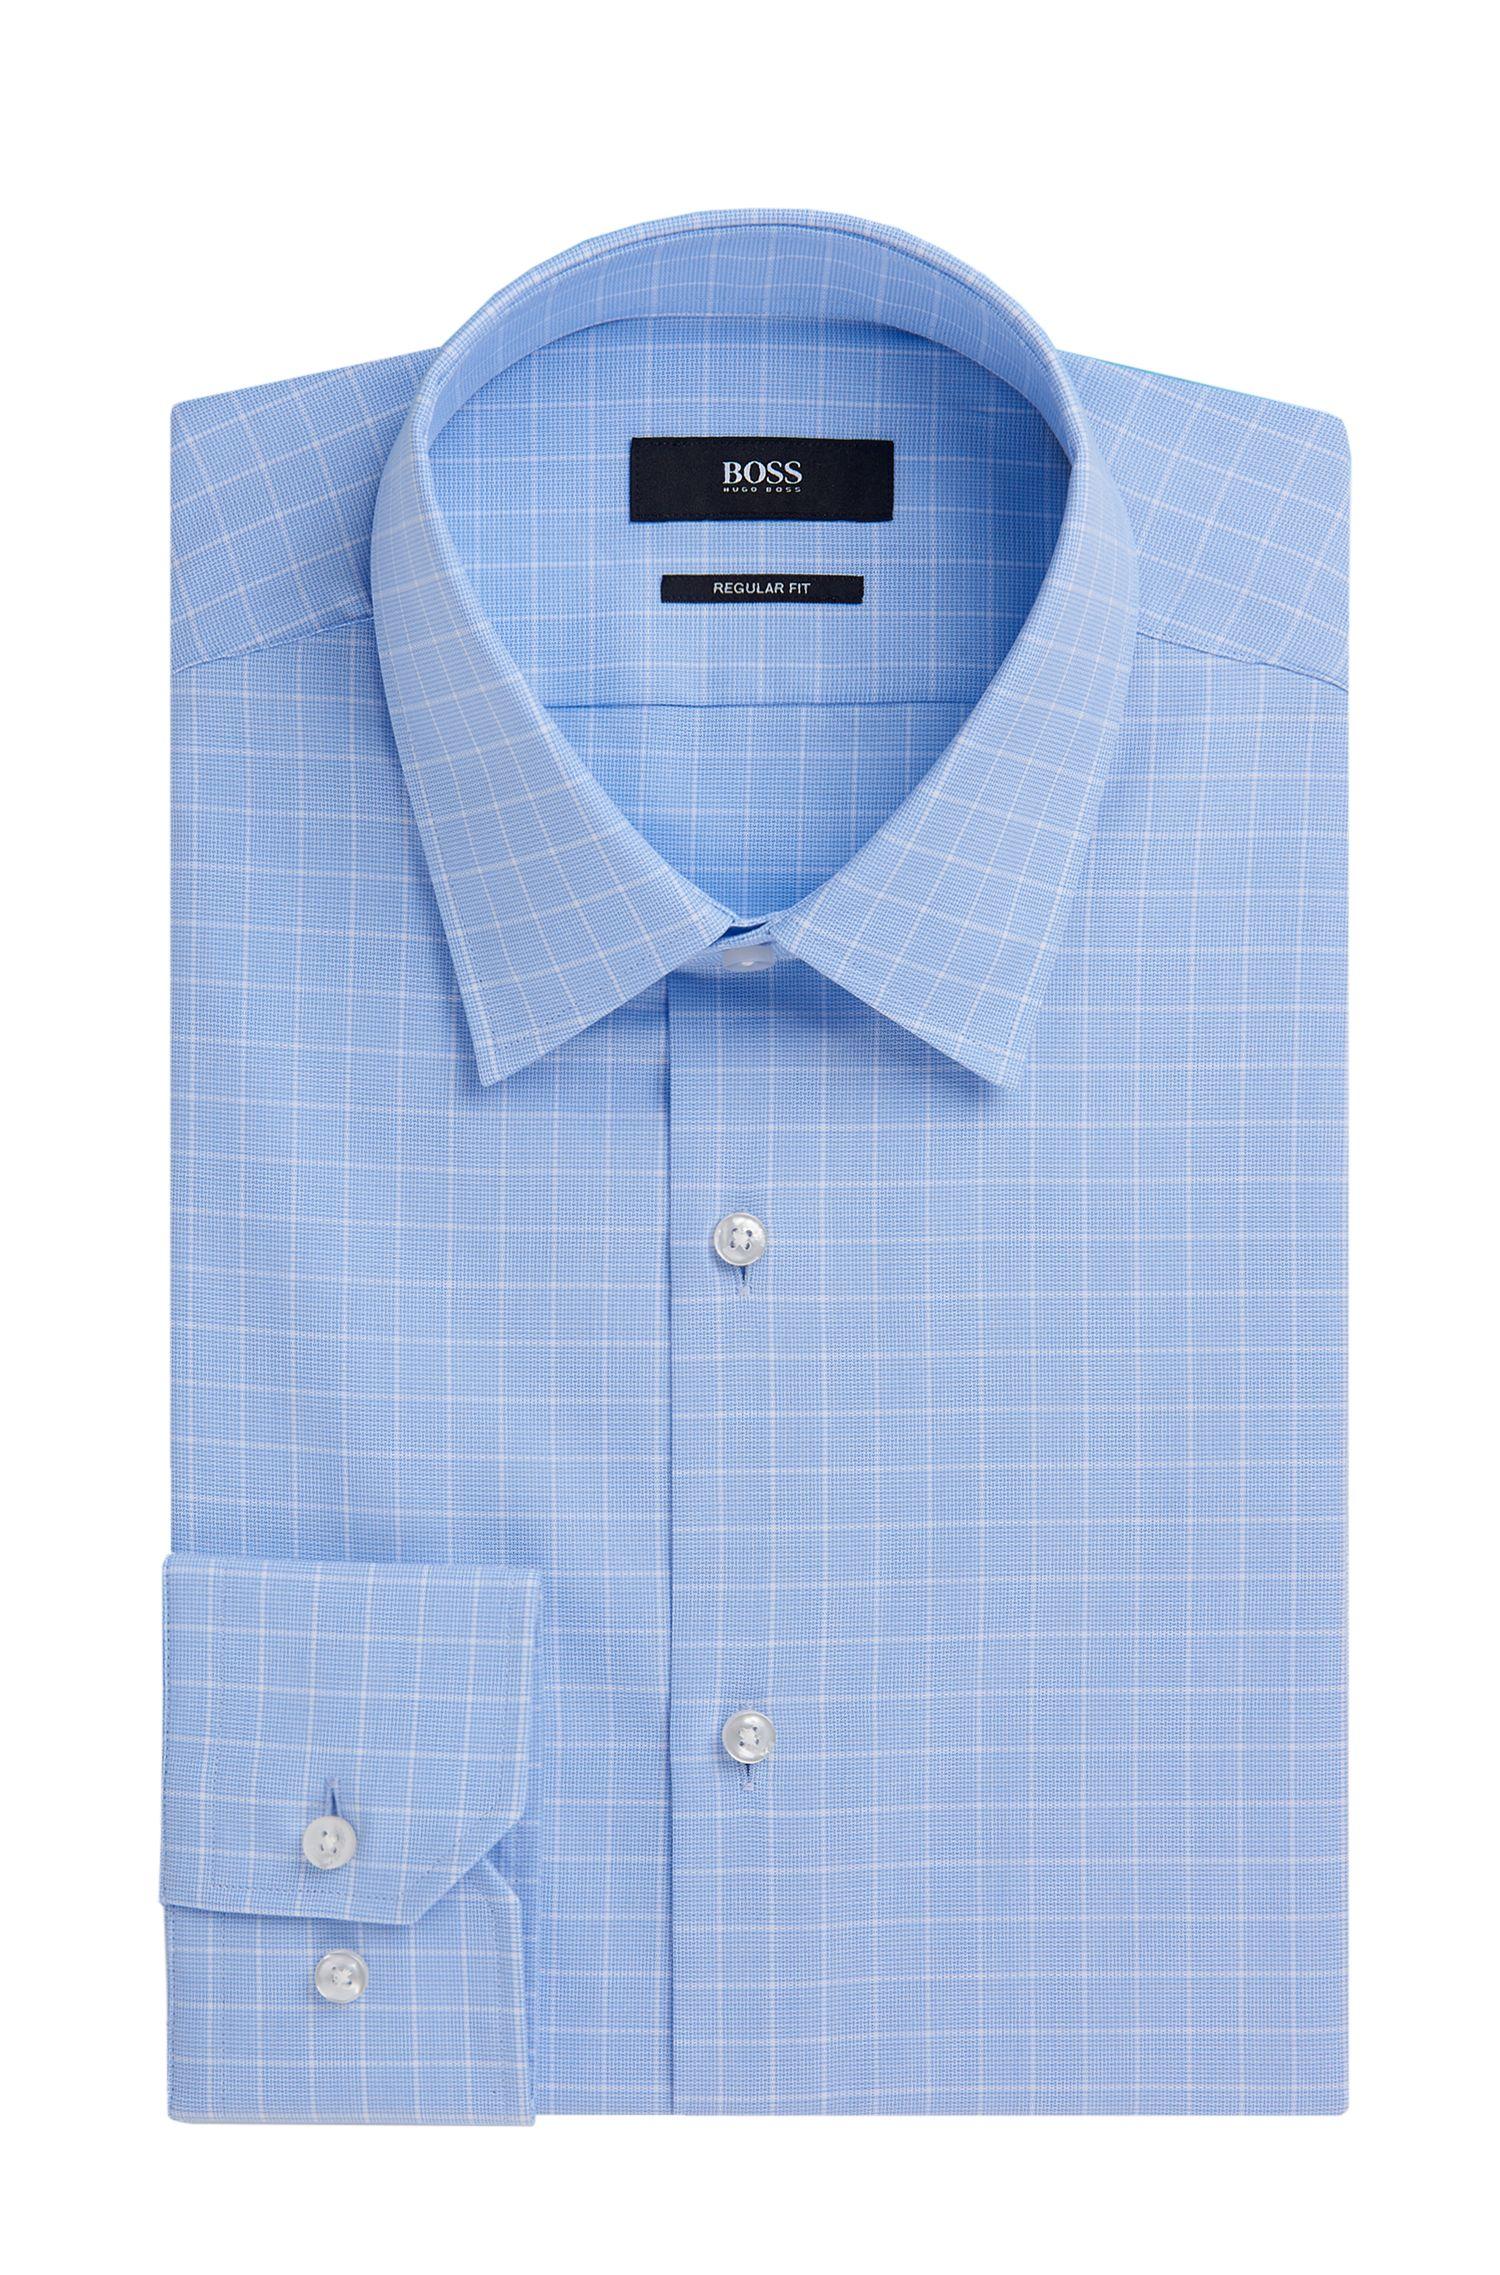 Check Cotton Dress Shirt, Regular Fit | Enzo